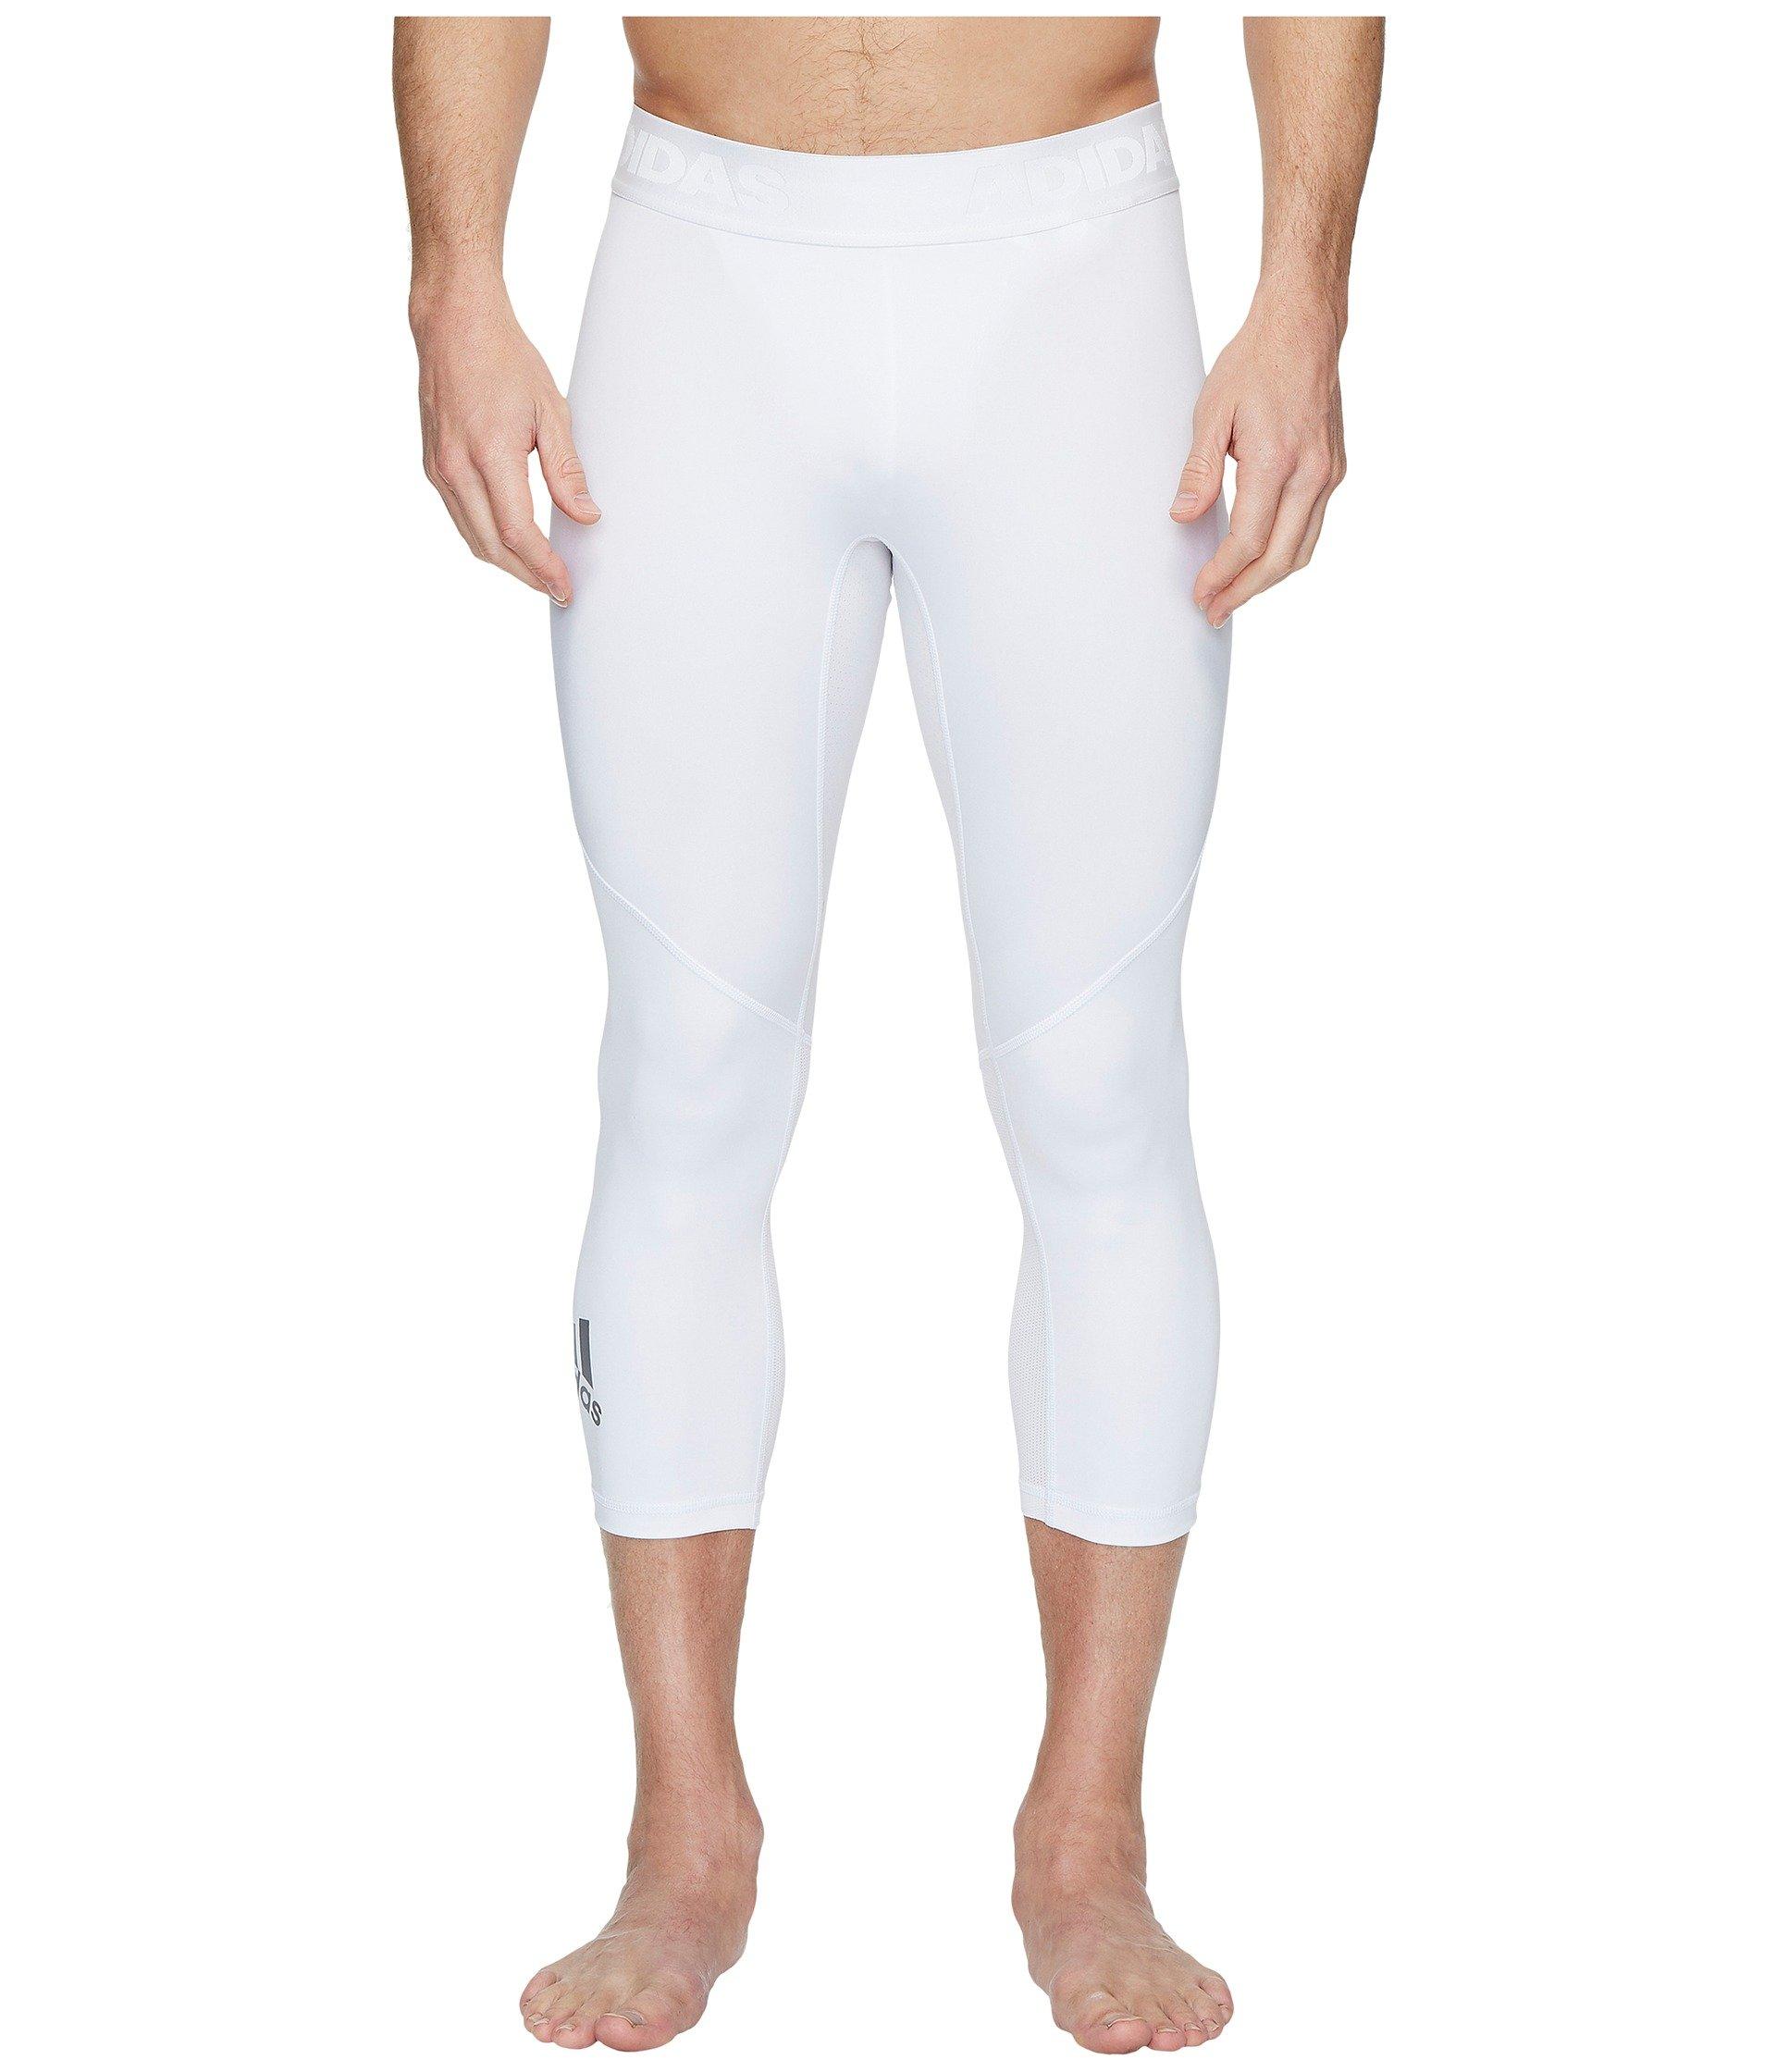 Sport 3 Adidas 4 Alphaskin White Tights qaFFw5f